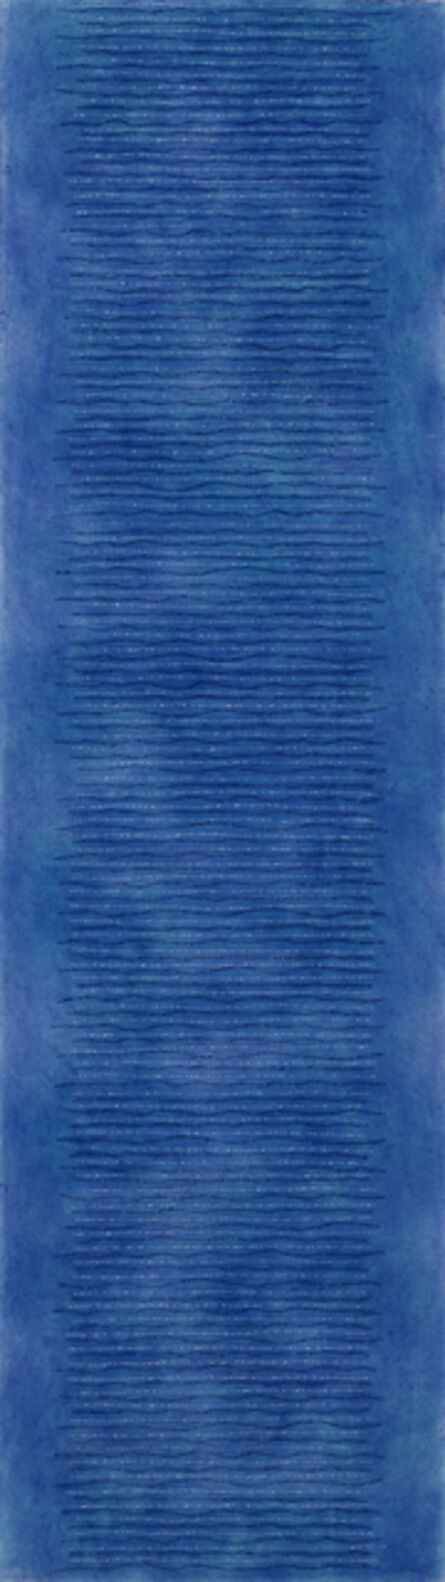 Edda Renouf, 'Water Sounds II  ', 2011